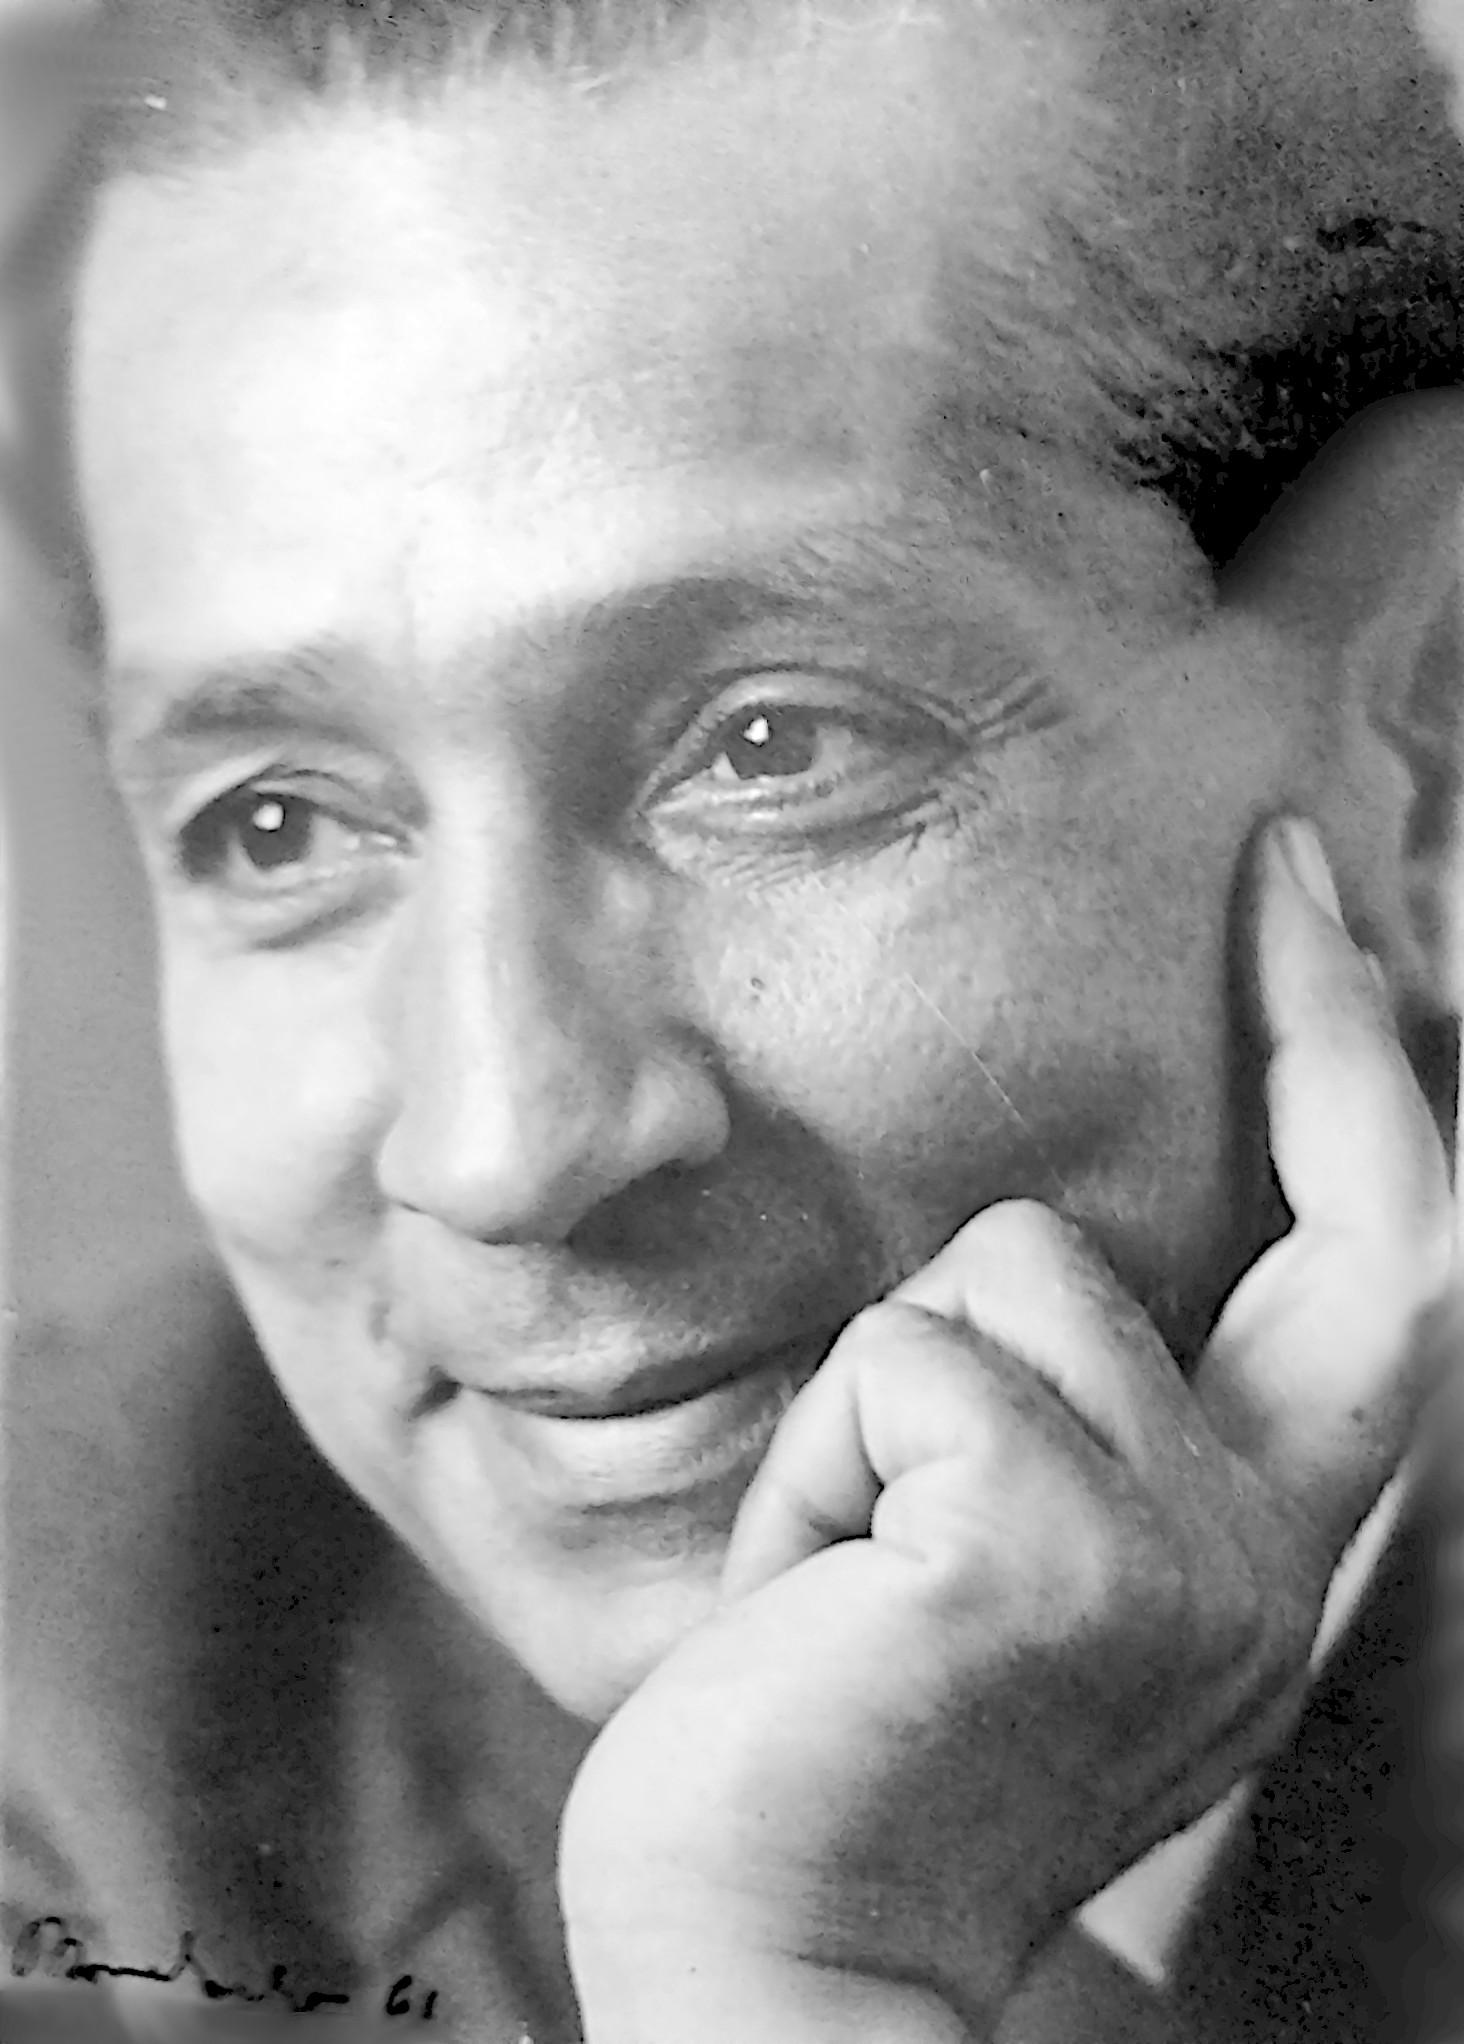 Image of Habib Osman from Wikidata